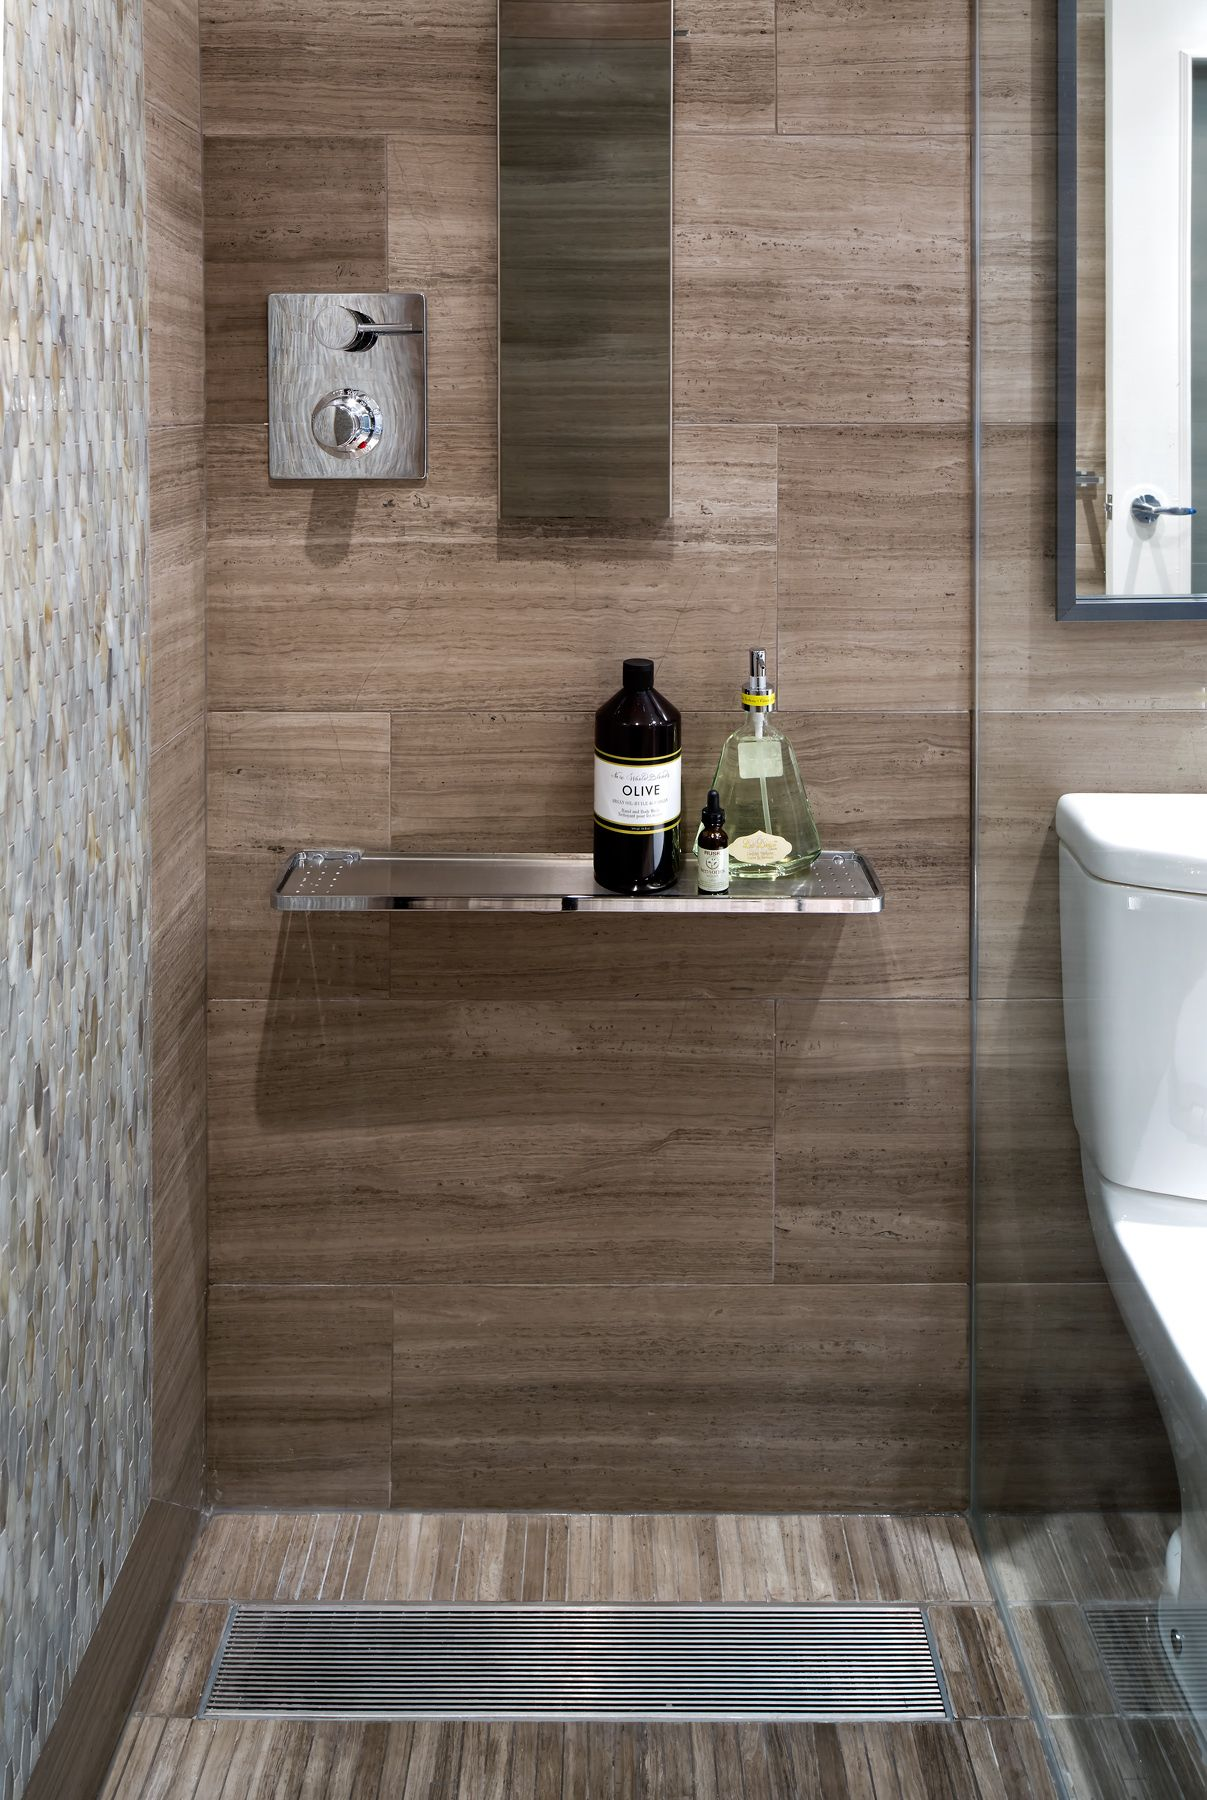 Condo Bathroom Shower Area Designed By Toronto Interior Design Group Www Tidg Ca Bathroom Design Inspiration Bathroom Design Toronto Interior Design Condo bathroom decorating ideas